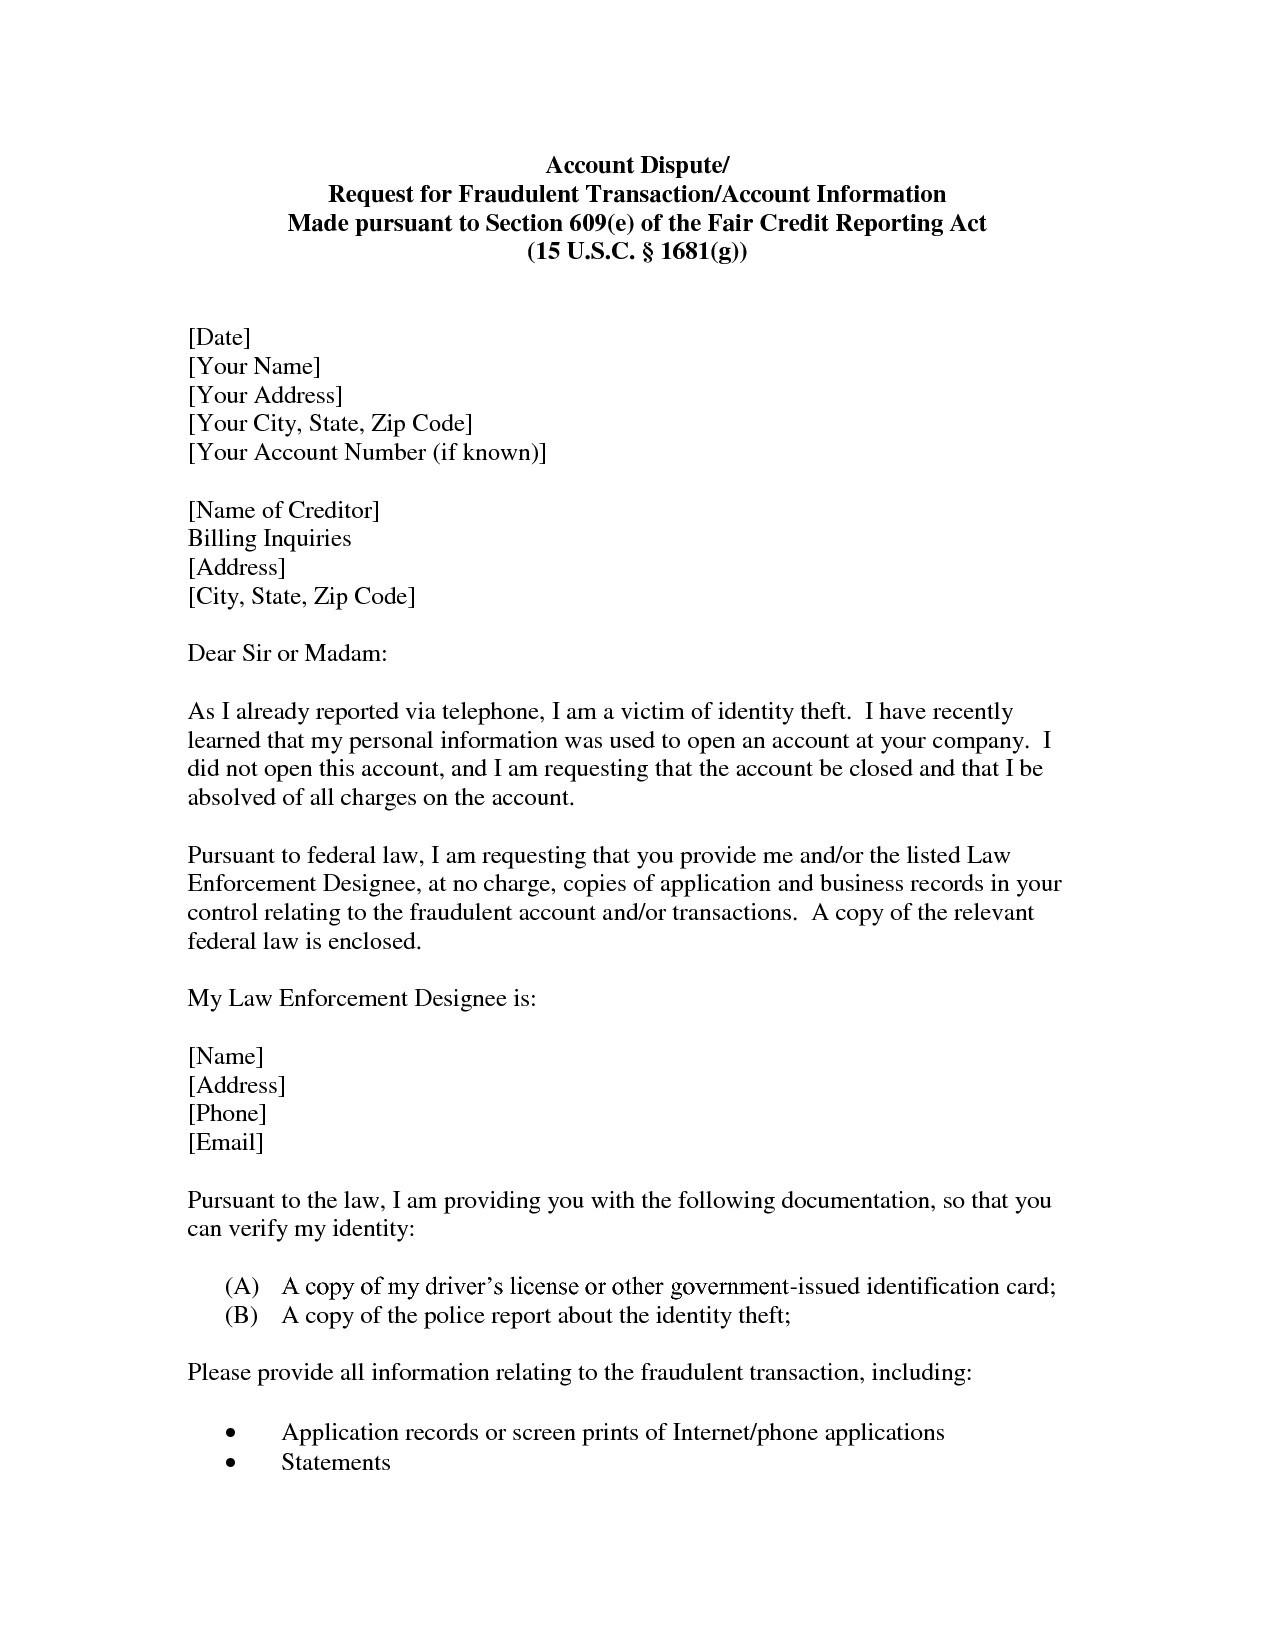 template for dispute letter firusersd7 sample 609 dispute letter